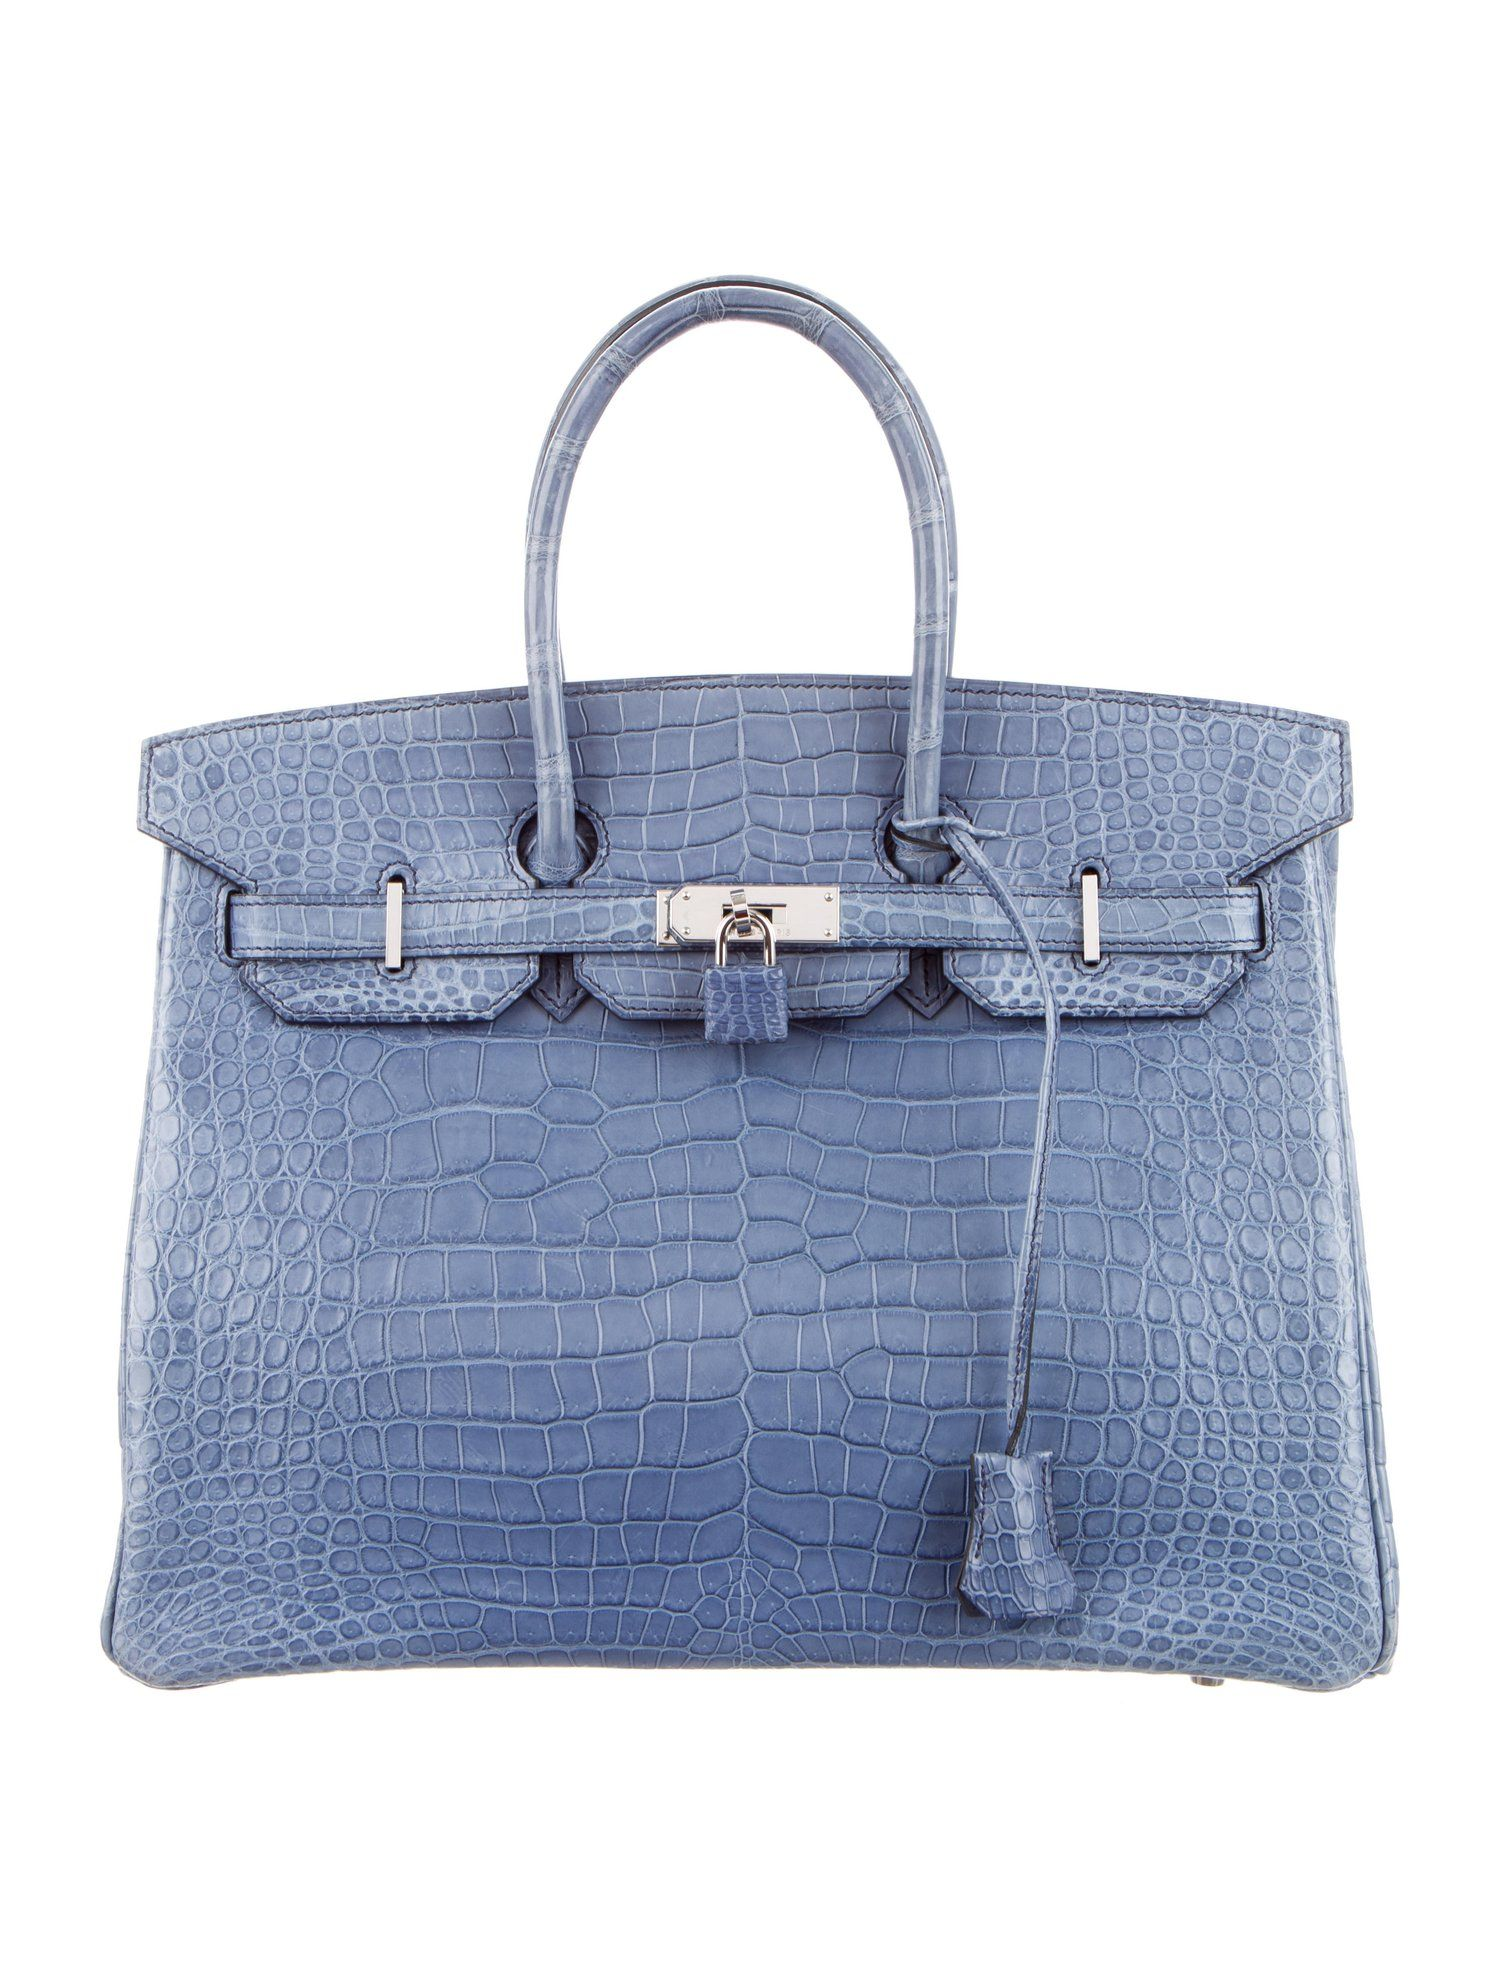 2302be8cb4 For sale Hermès Porosus Crocodile Birkin 35 - Handbags - HER166761 ...